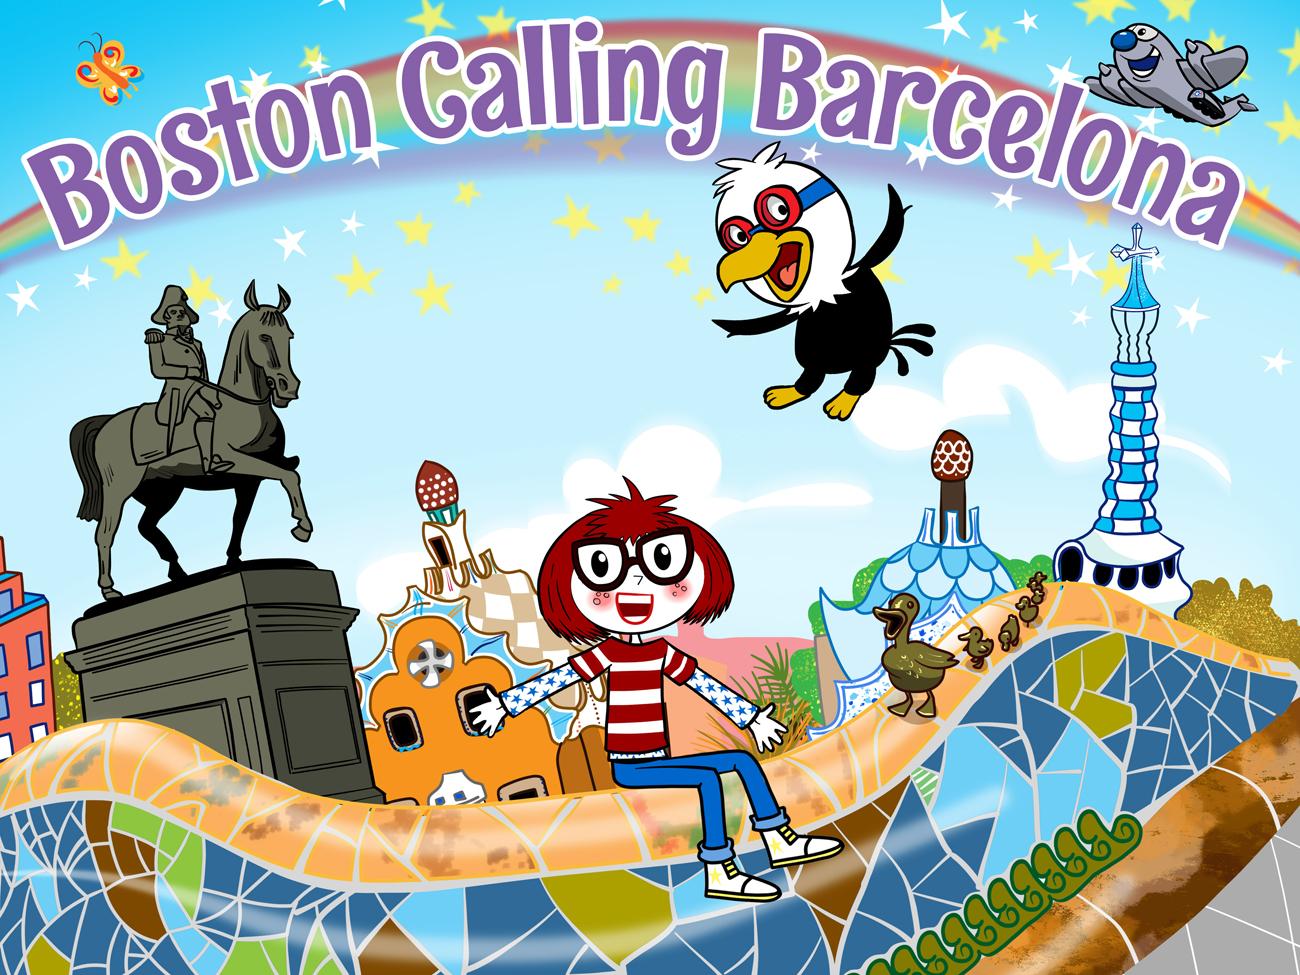 Boston calling barcelona vector art